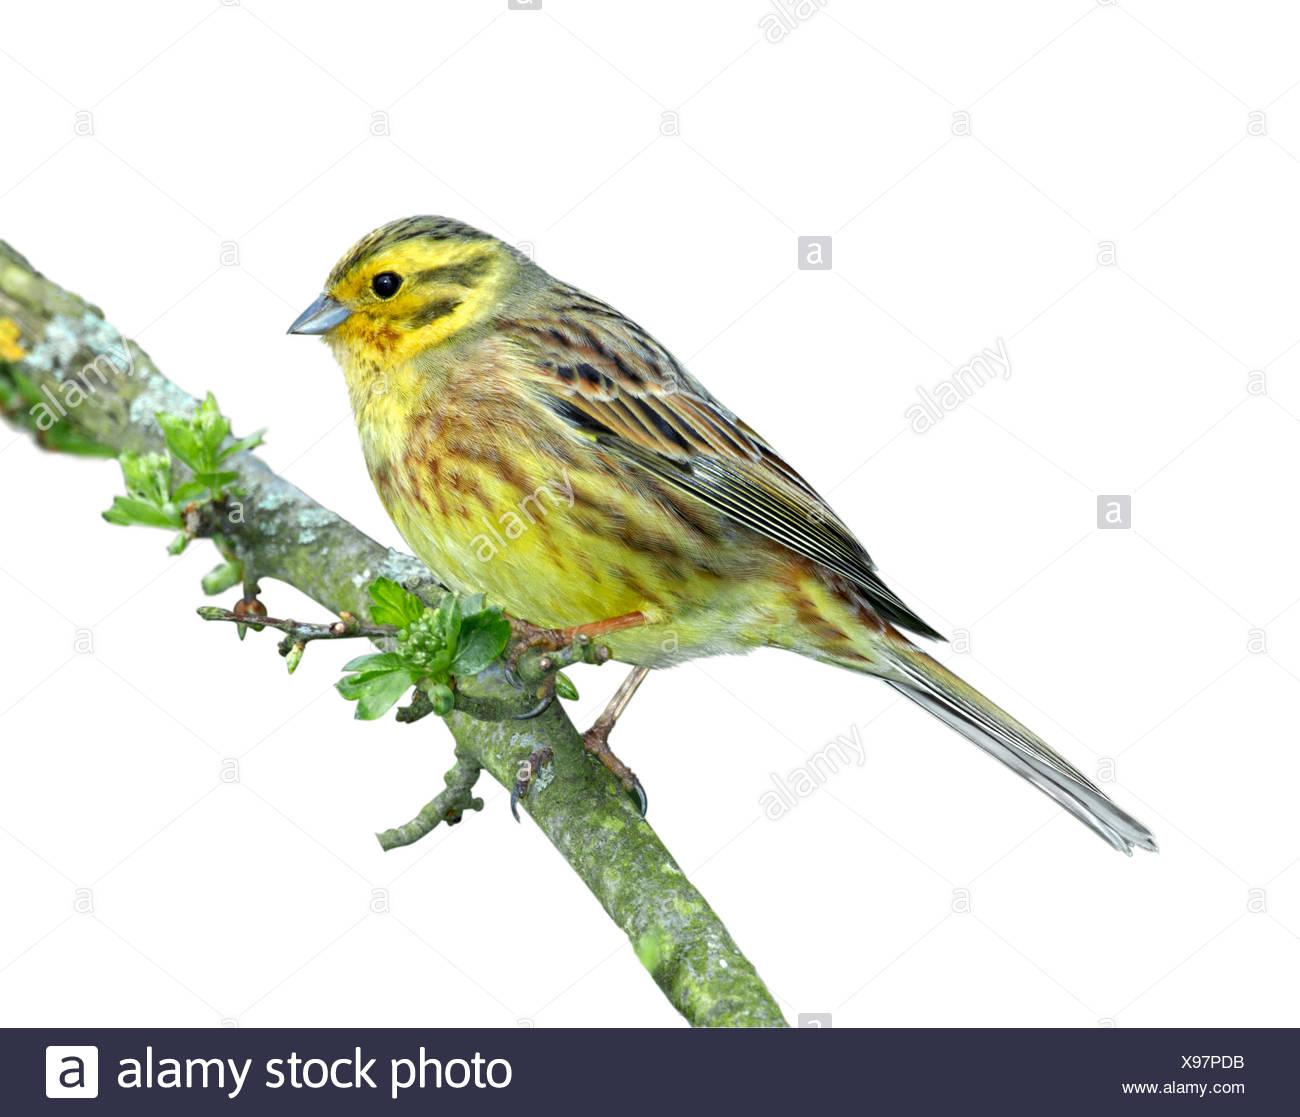 Yellowhammer - Emberiza citrinella - Stock Image